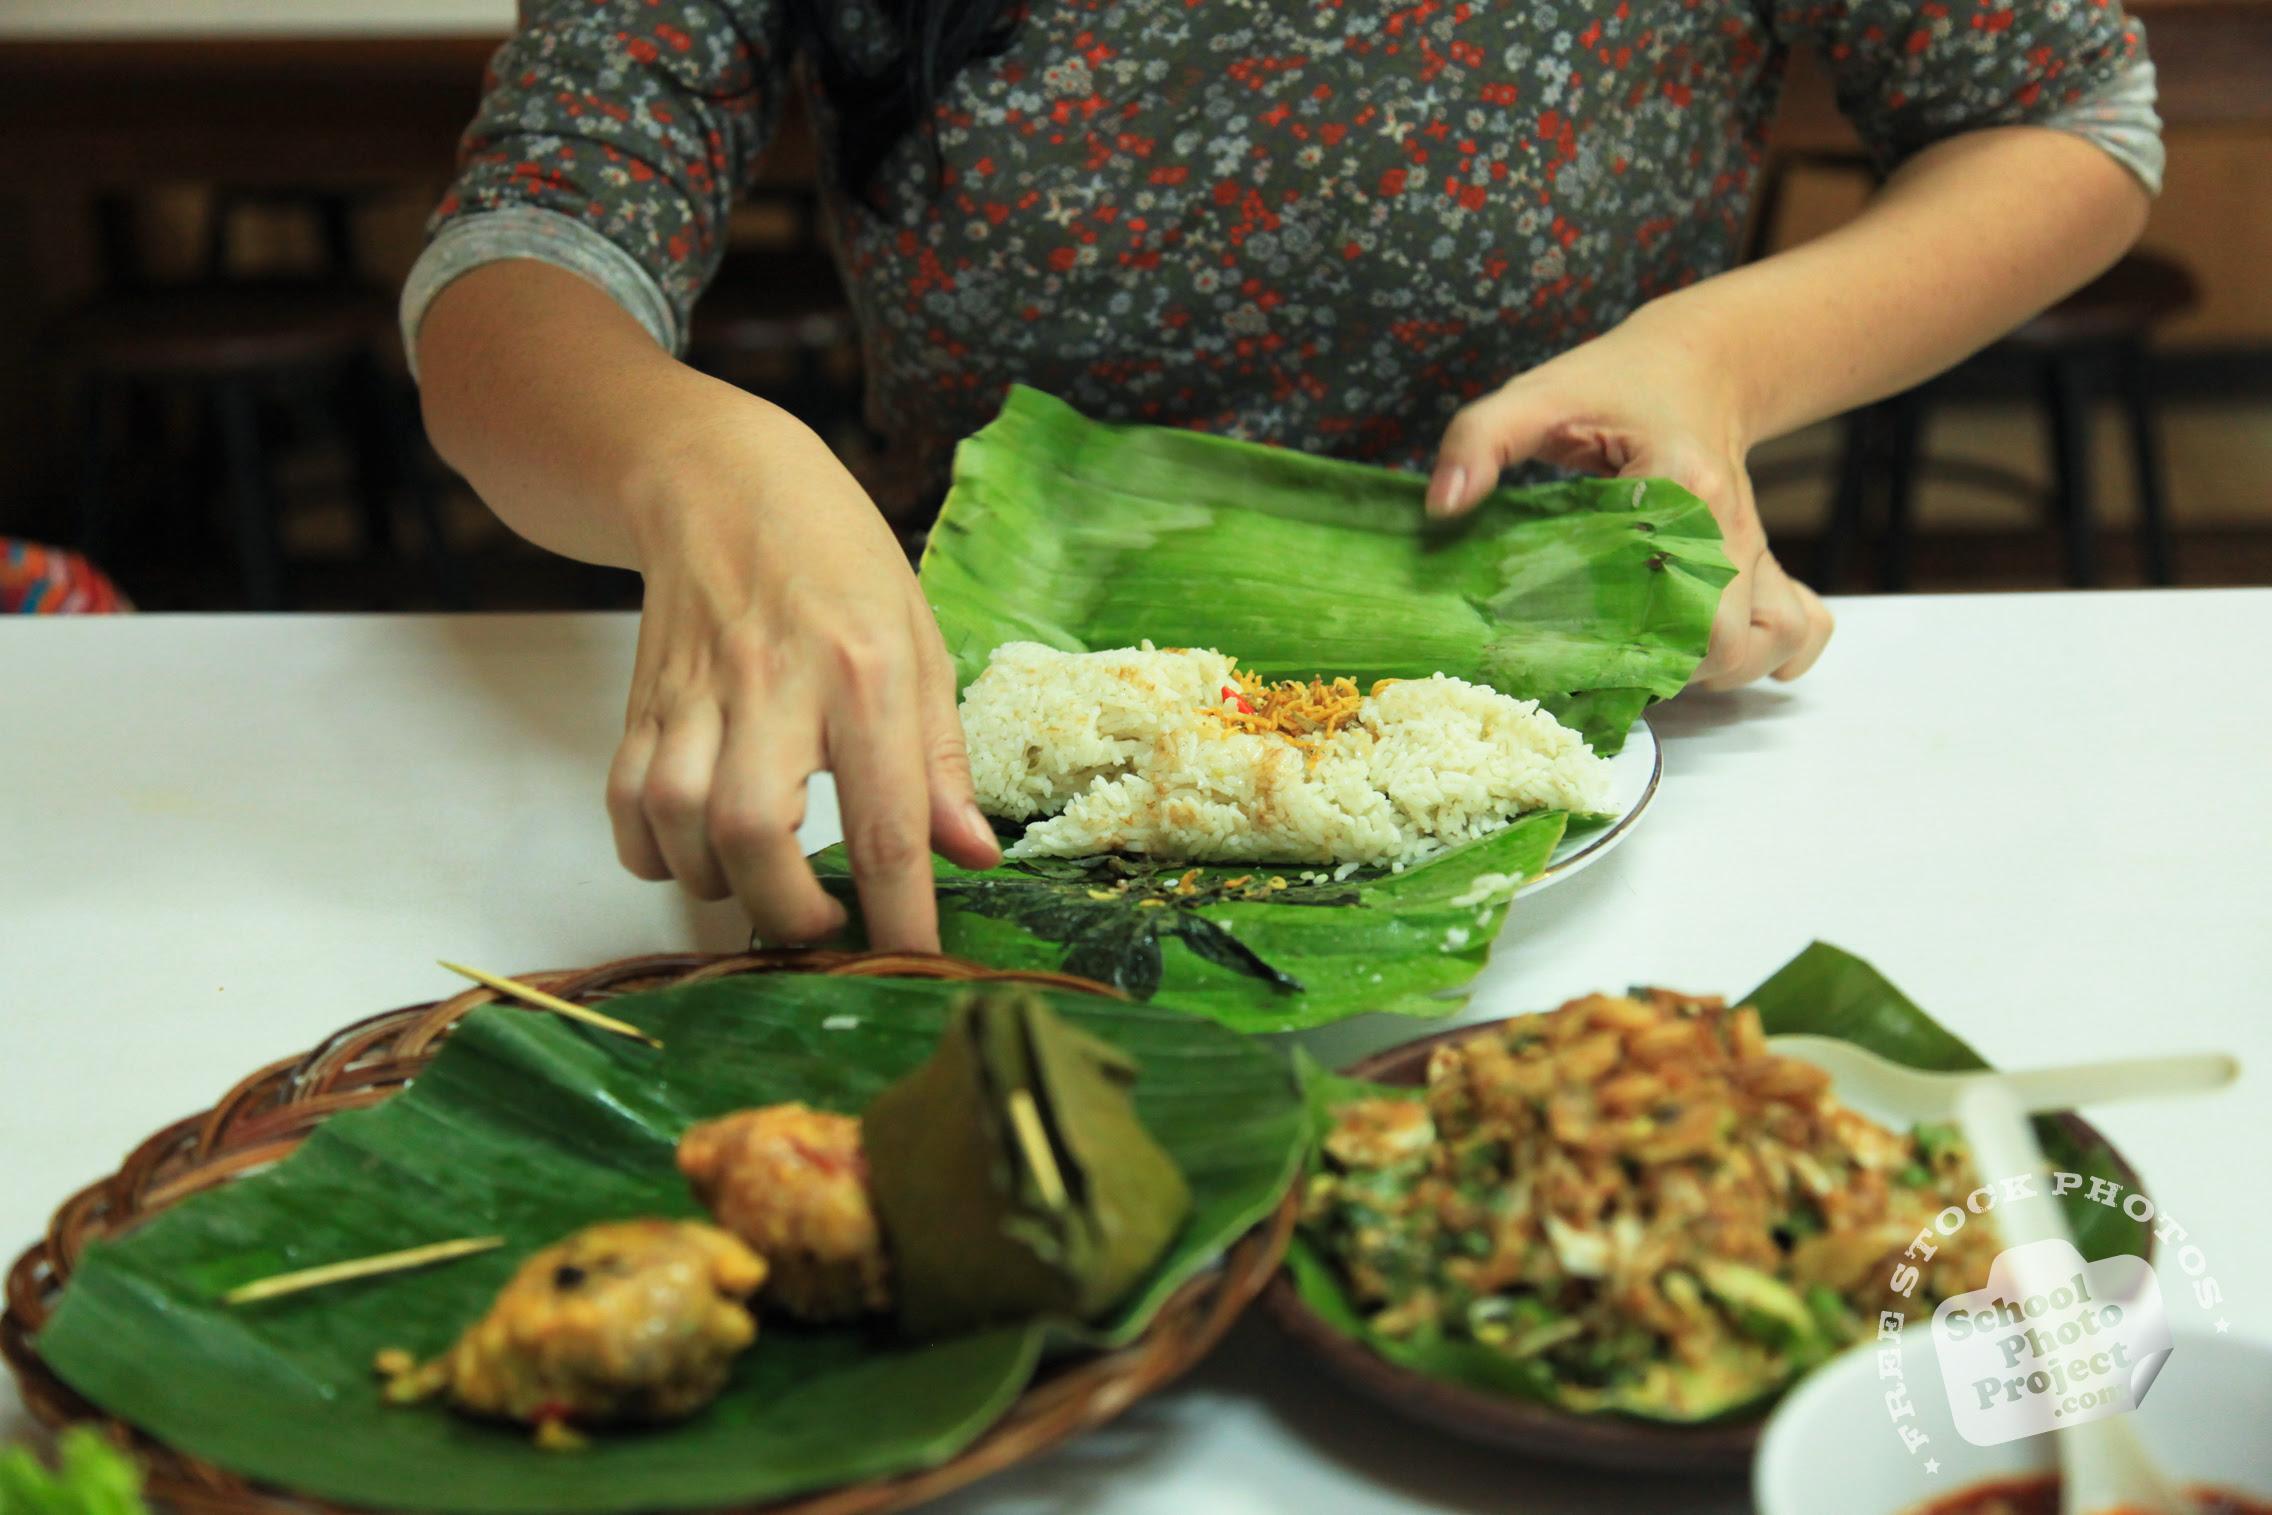 Preparing Food, FREE Stock Photo, Image, Picture: Preparing Sundanese Food, Royalty-Free Food